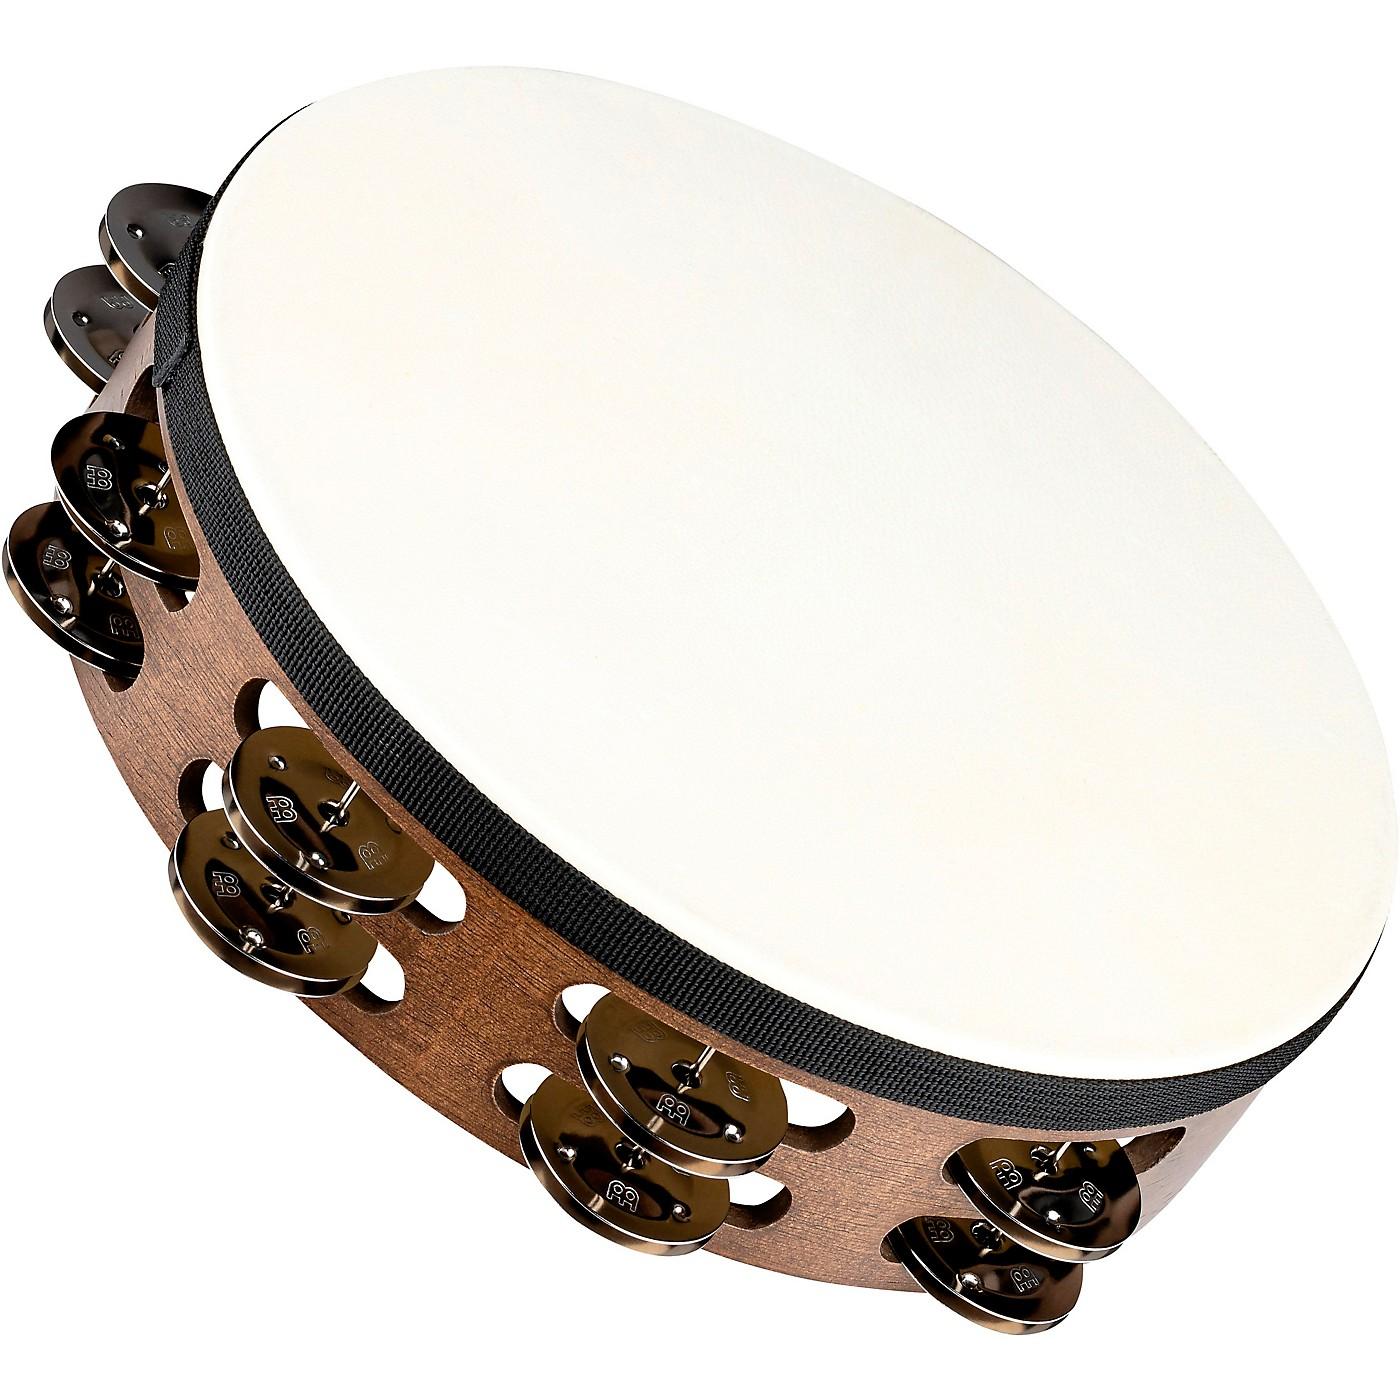 MEINL Headed Wood Tambourine with Double Row Steel Jingles thumbnail